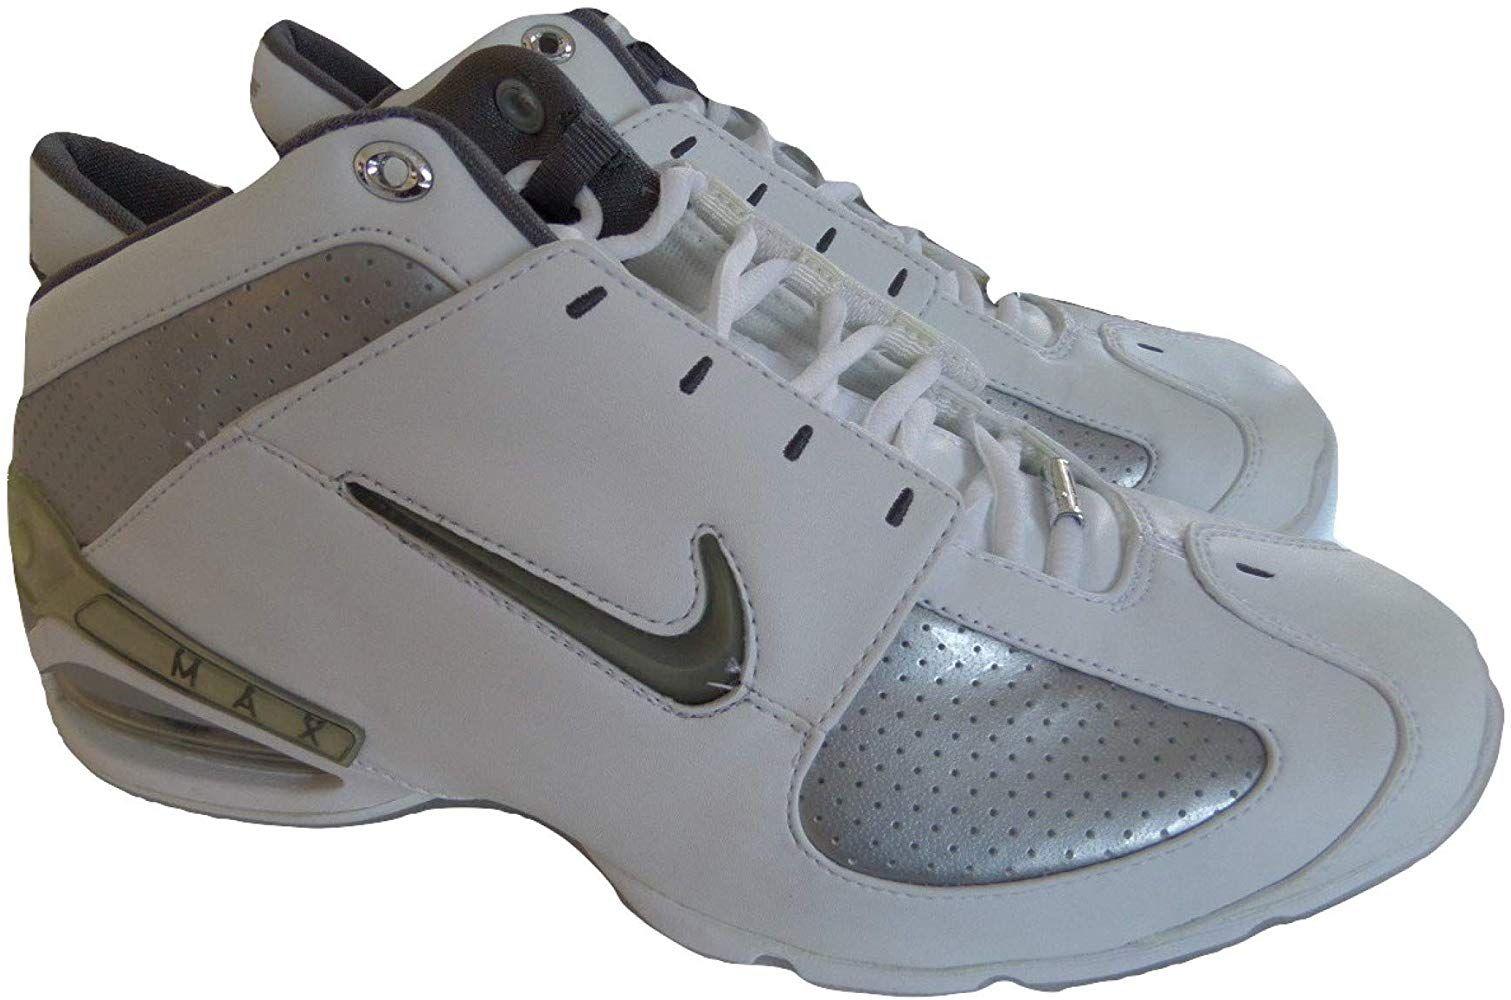 Nike OG 2003 Air Max Frenzy Basketball Sneakers Trainers ...